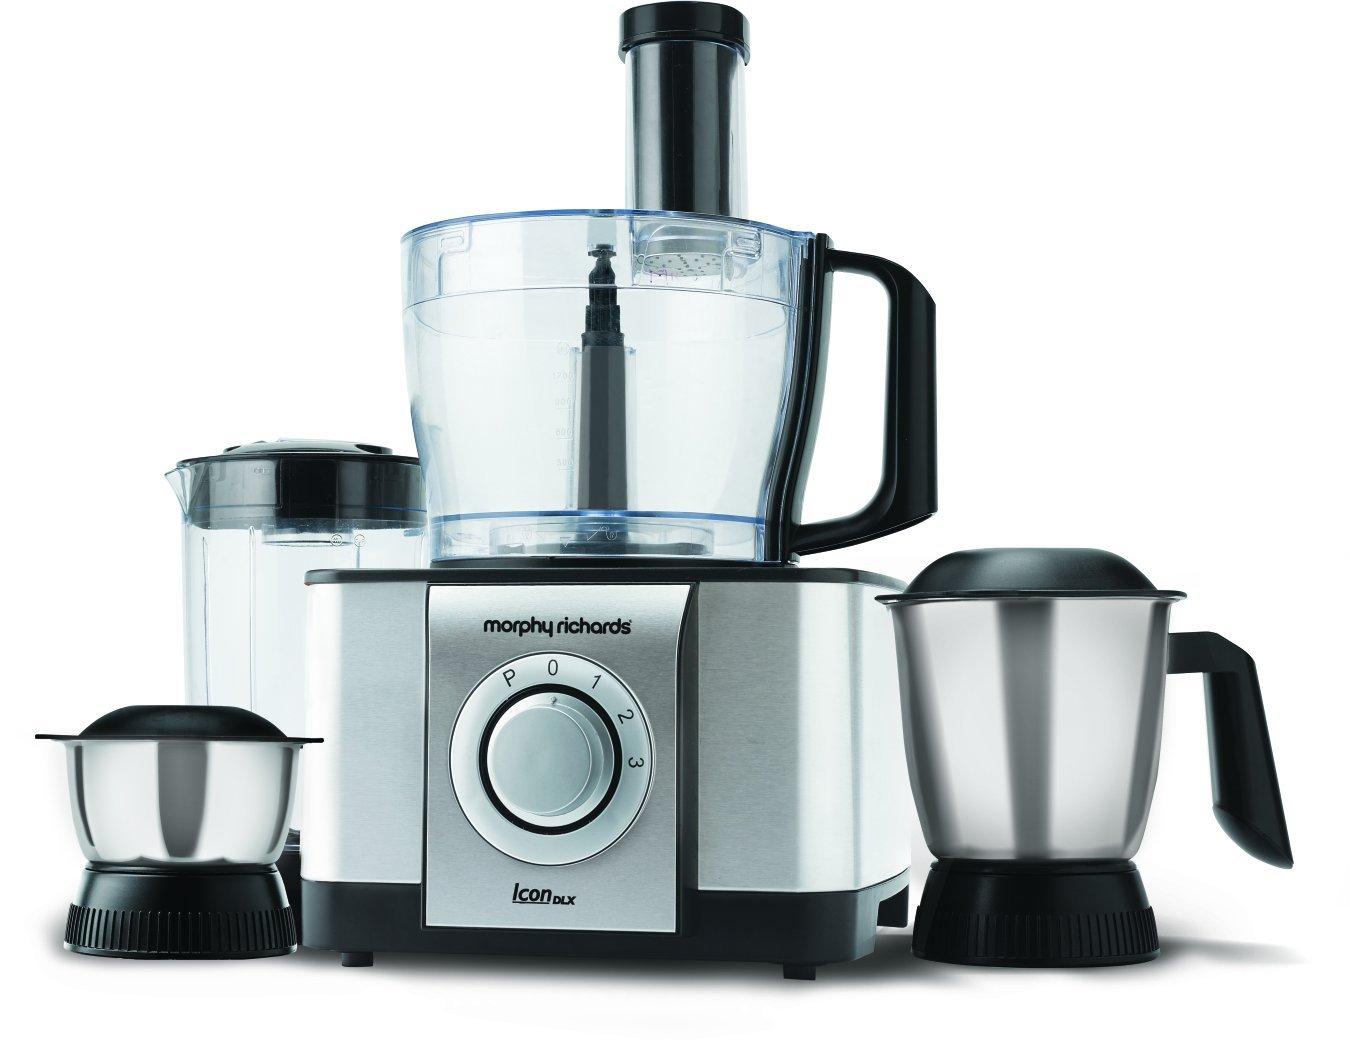 Uncategorized Morphy Richards Kitchen Appliances morphy richards icon dlx food processor reviews image